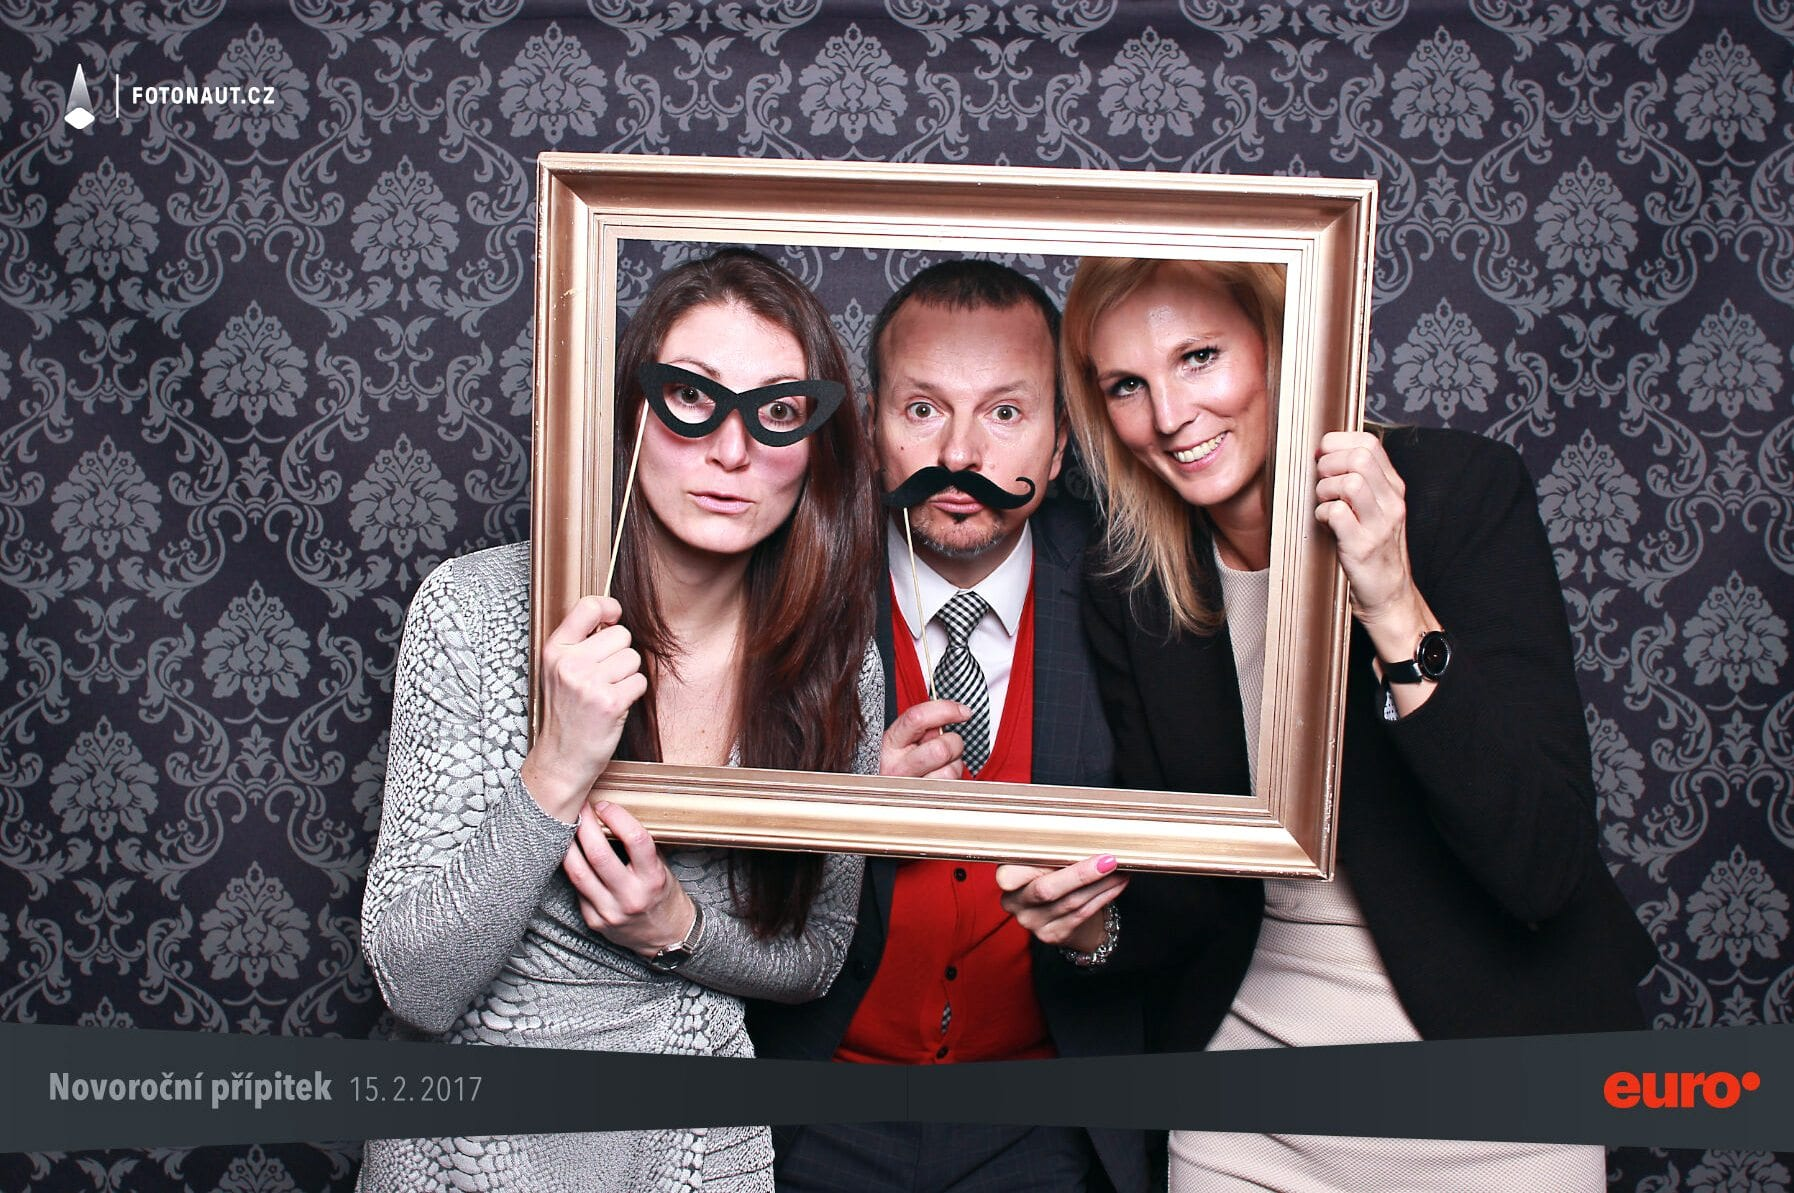 fotokoutek-euro-15-2-2017-223116